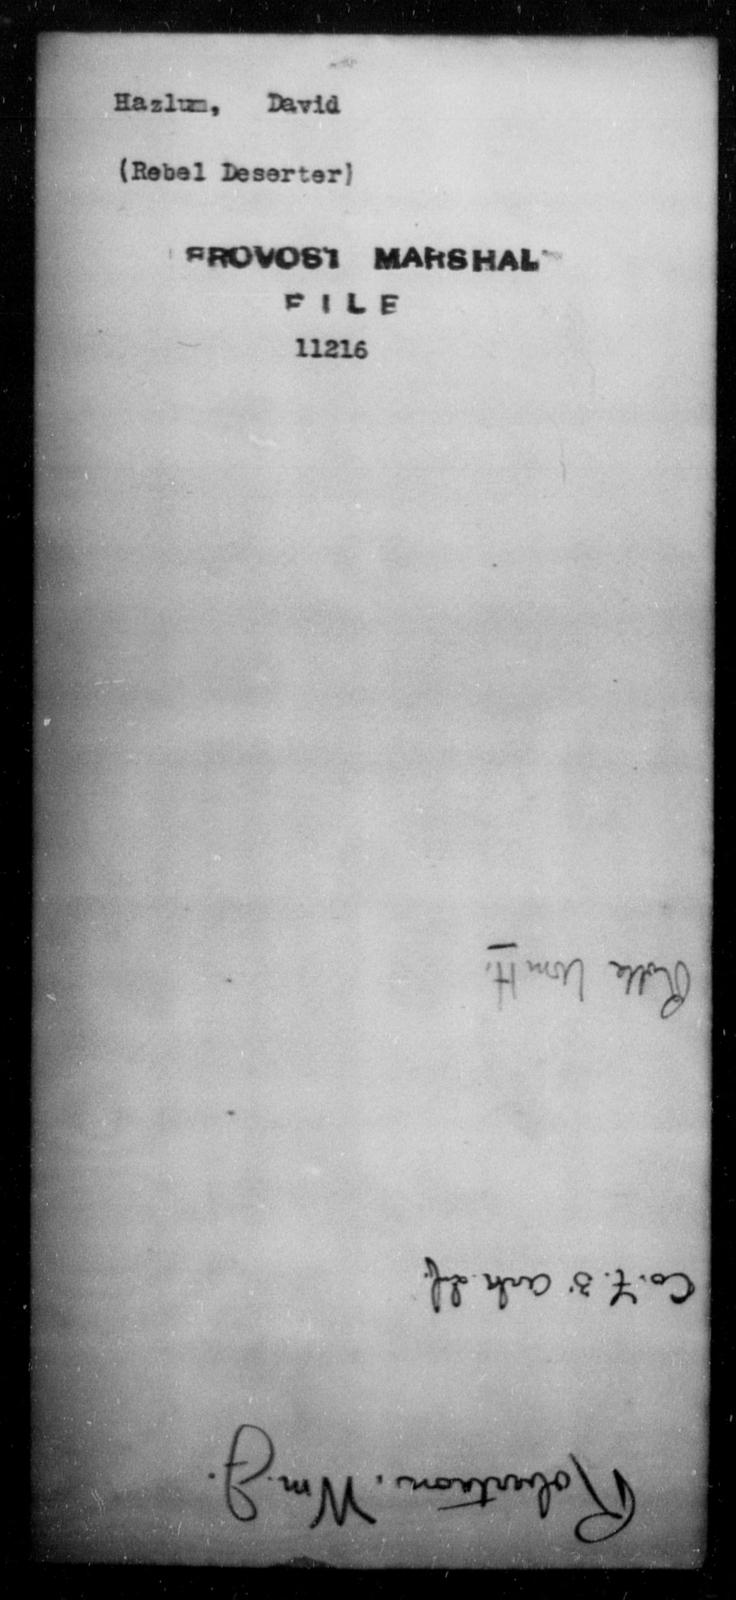 Hazlum, David - State: [Blank] - Year: [Blank]